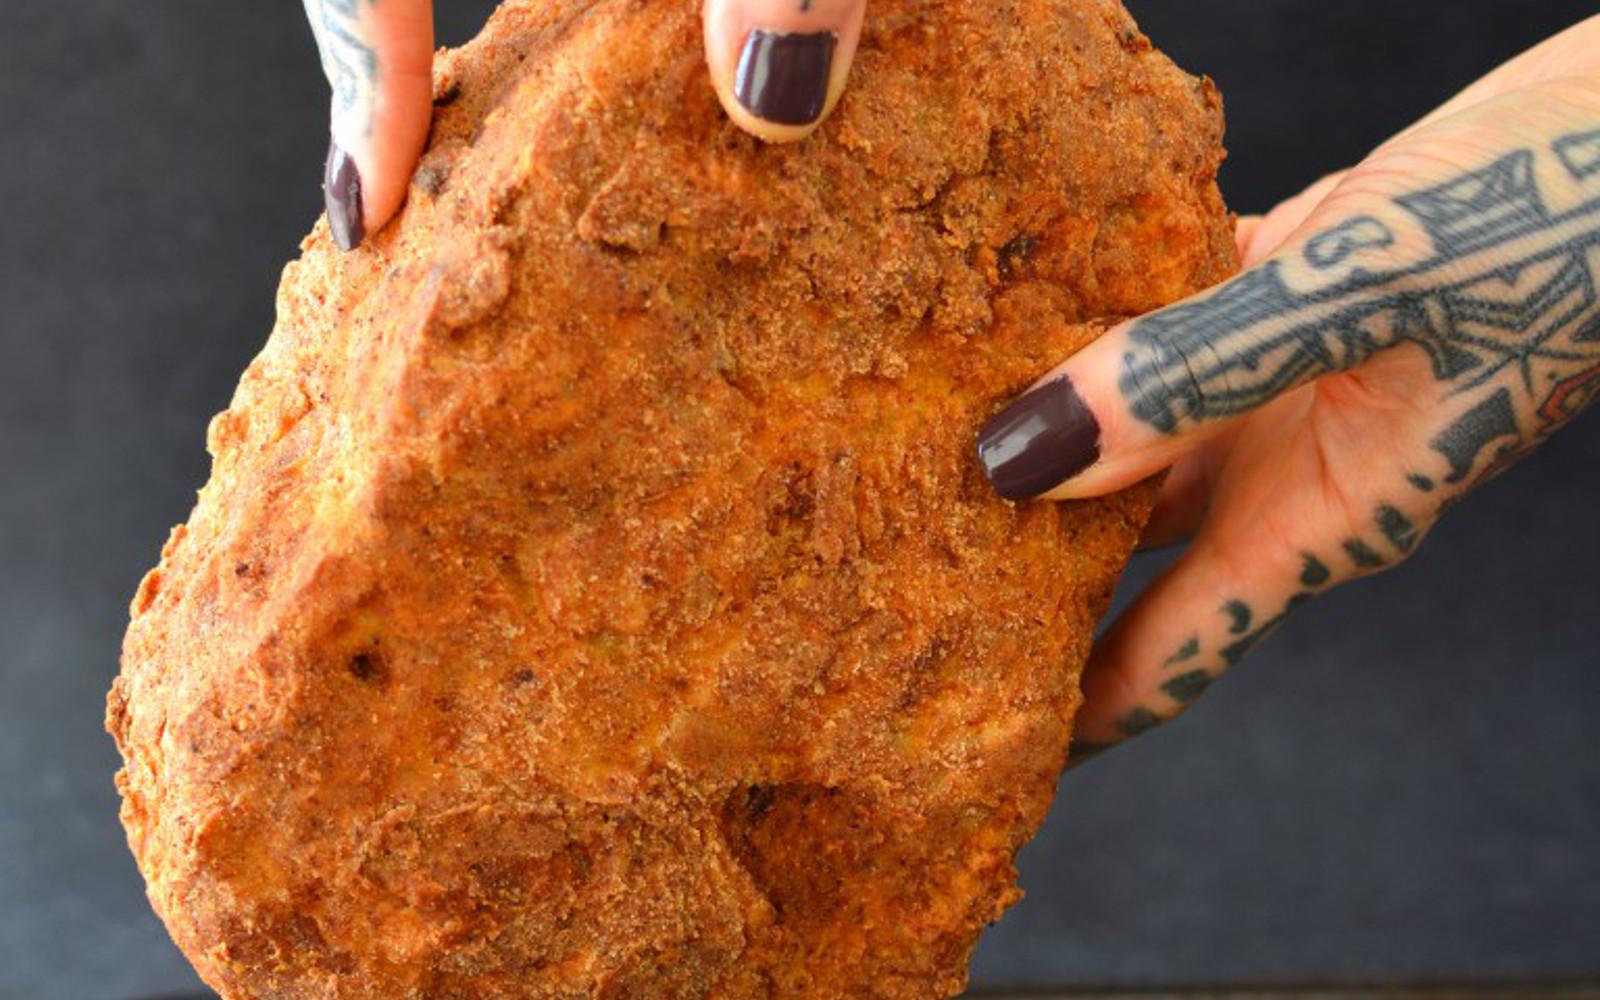 vegan Giant Chicken Nugget